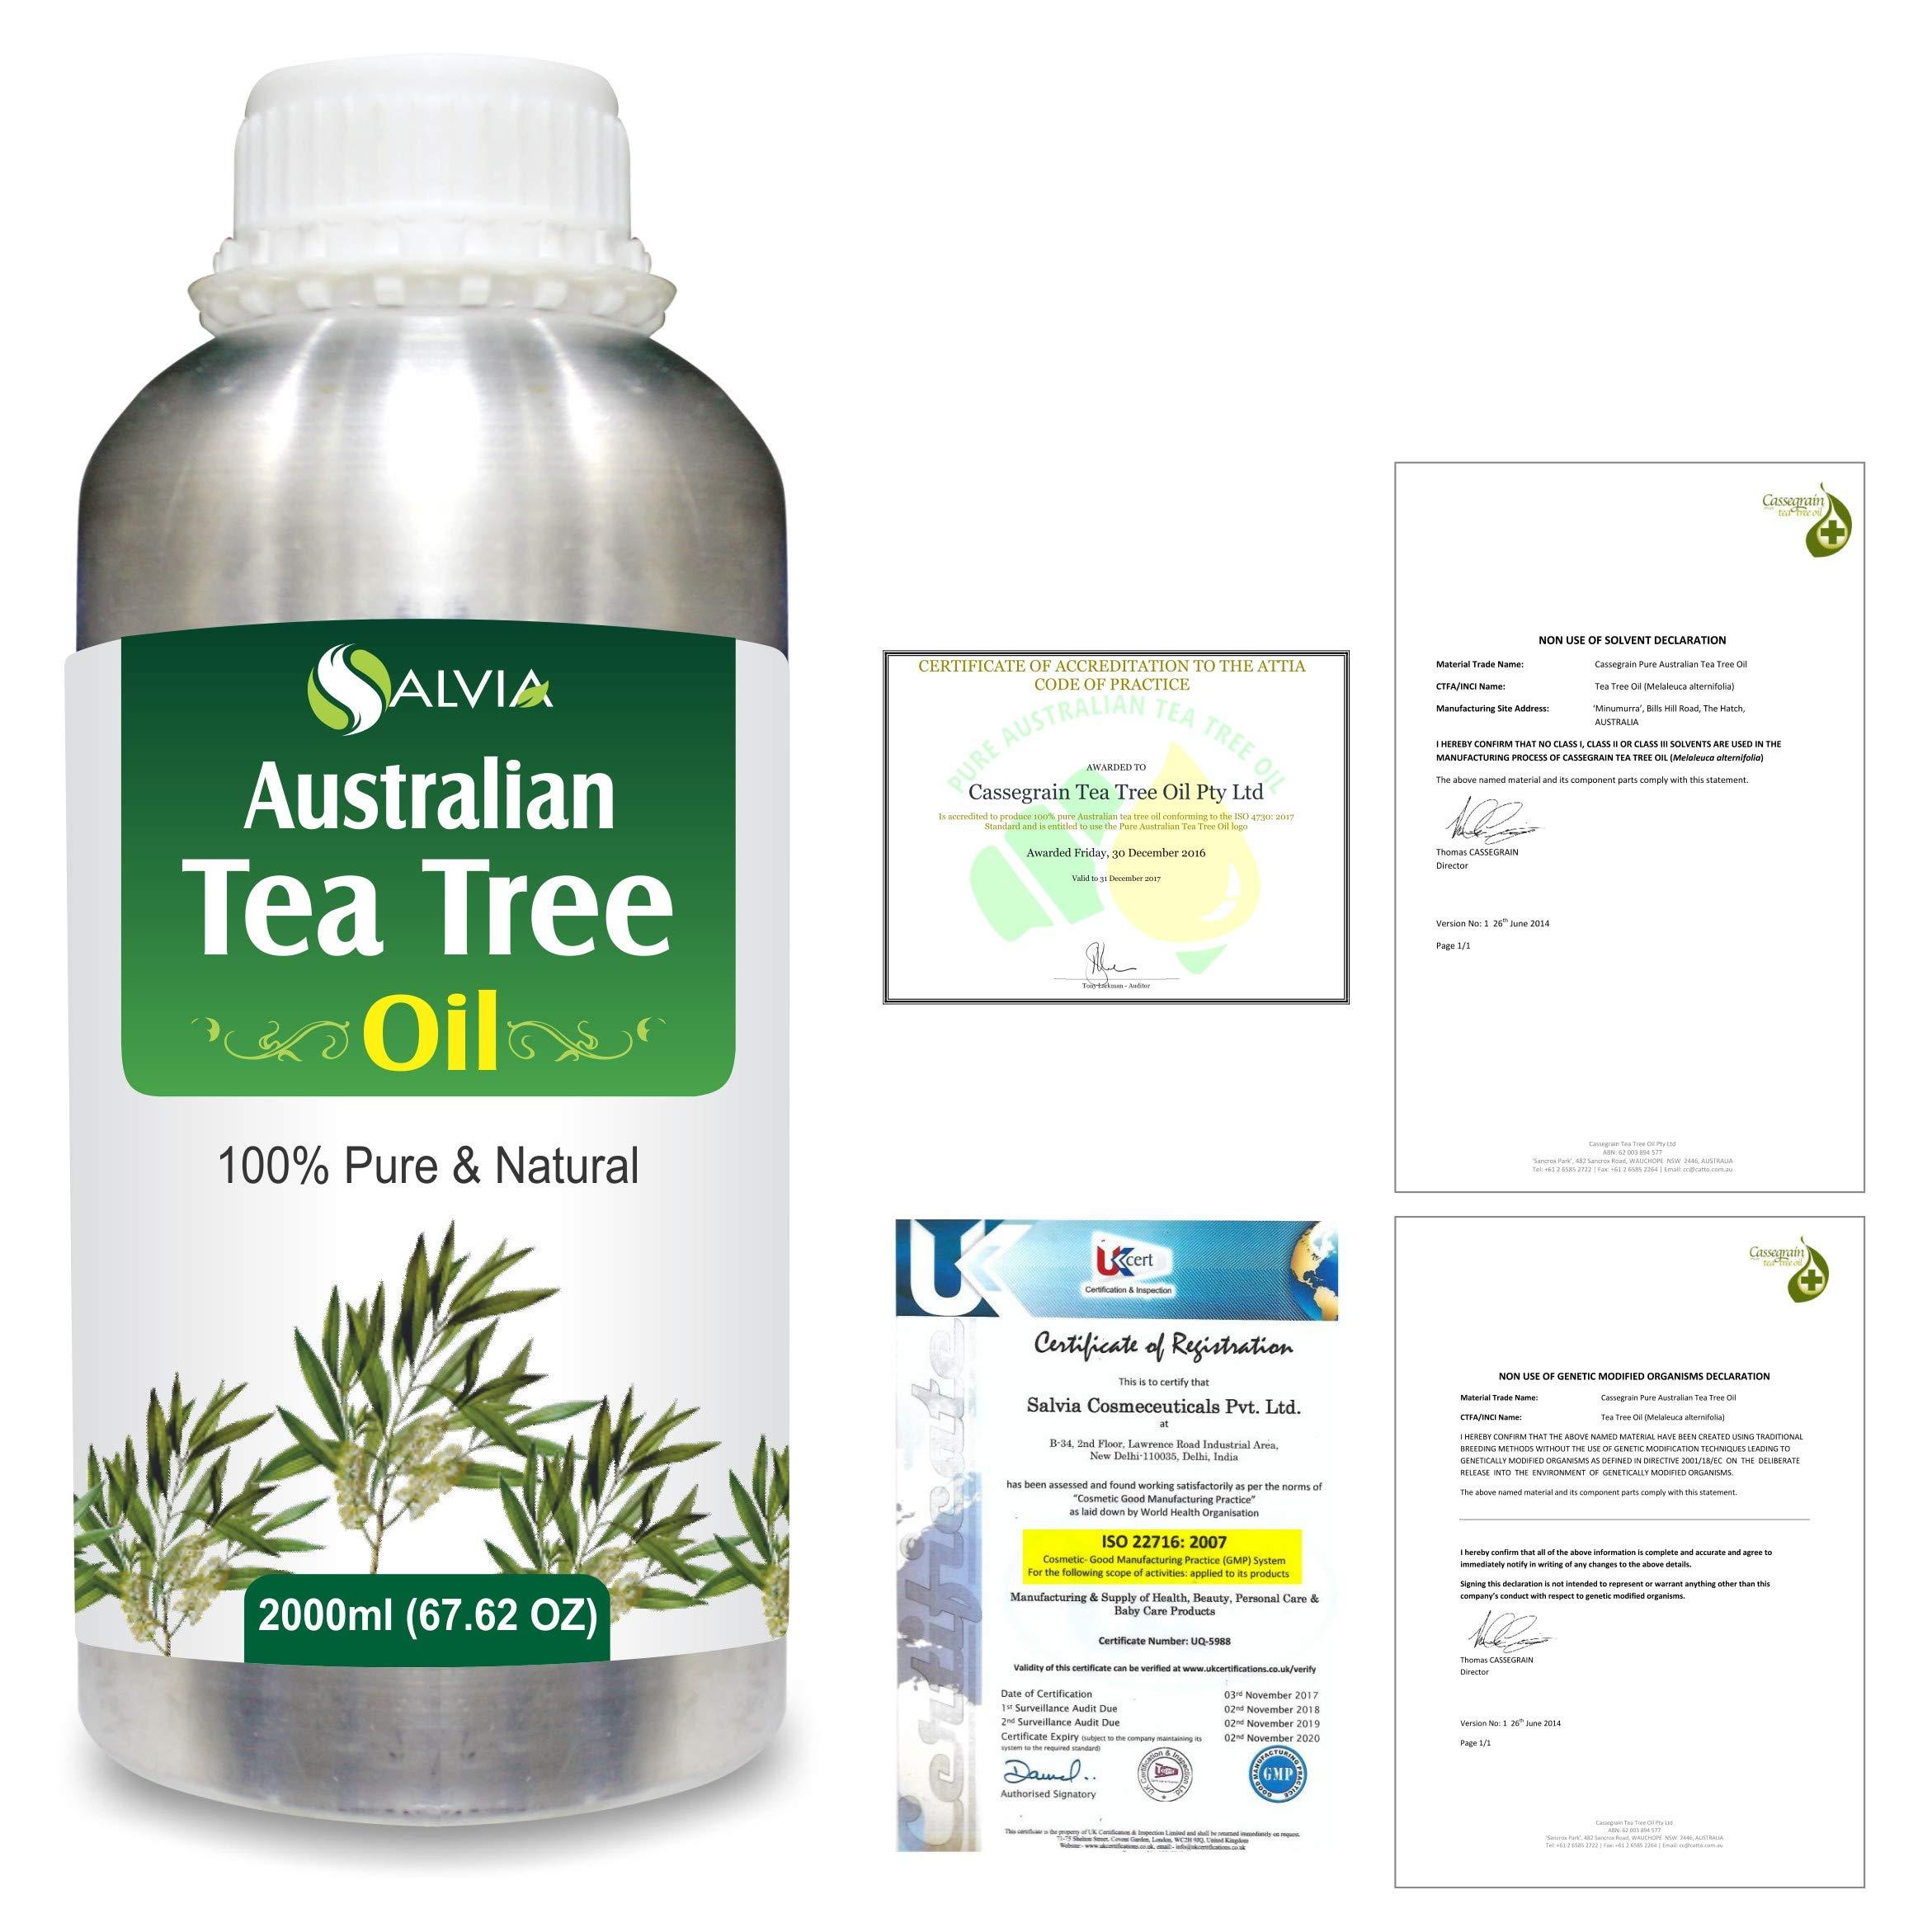 Tea Tree (Melaleuca alternifolia) 100% Pure Australian Certified Non GMO Essential Oil 2000ml/67.6 fl. oz. Express Shipping